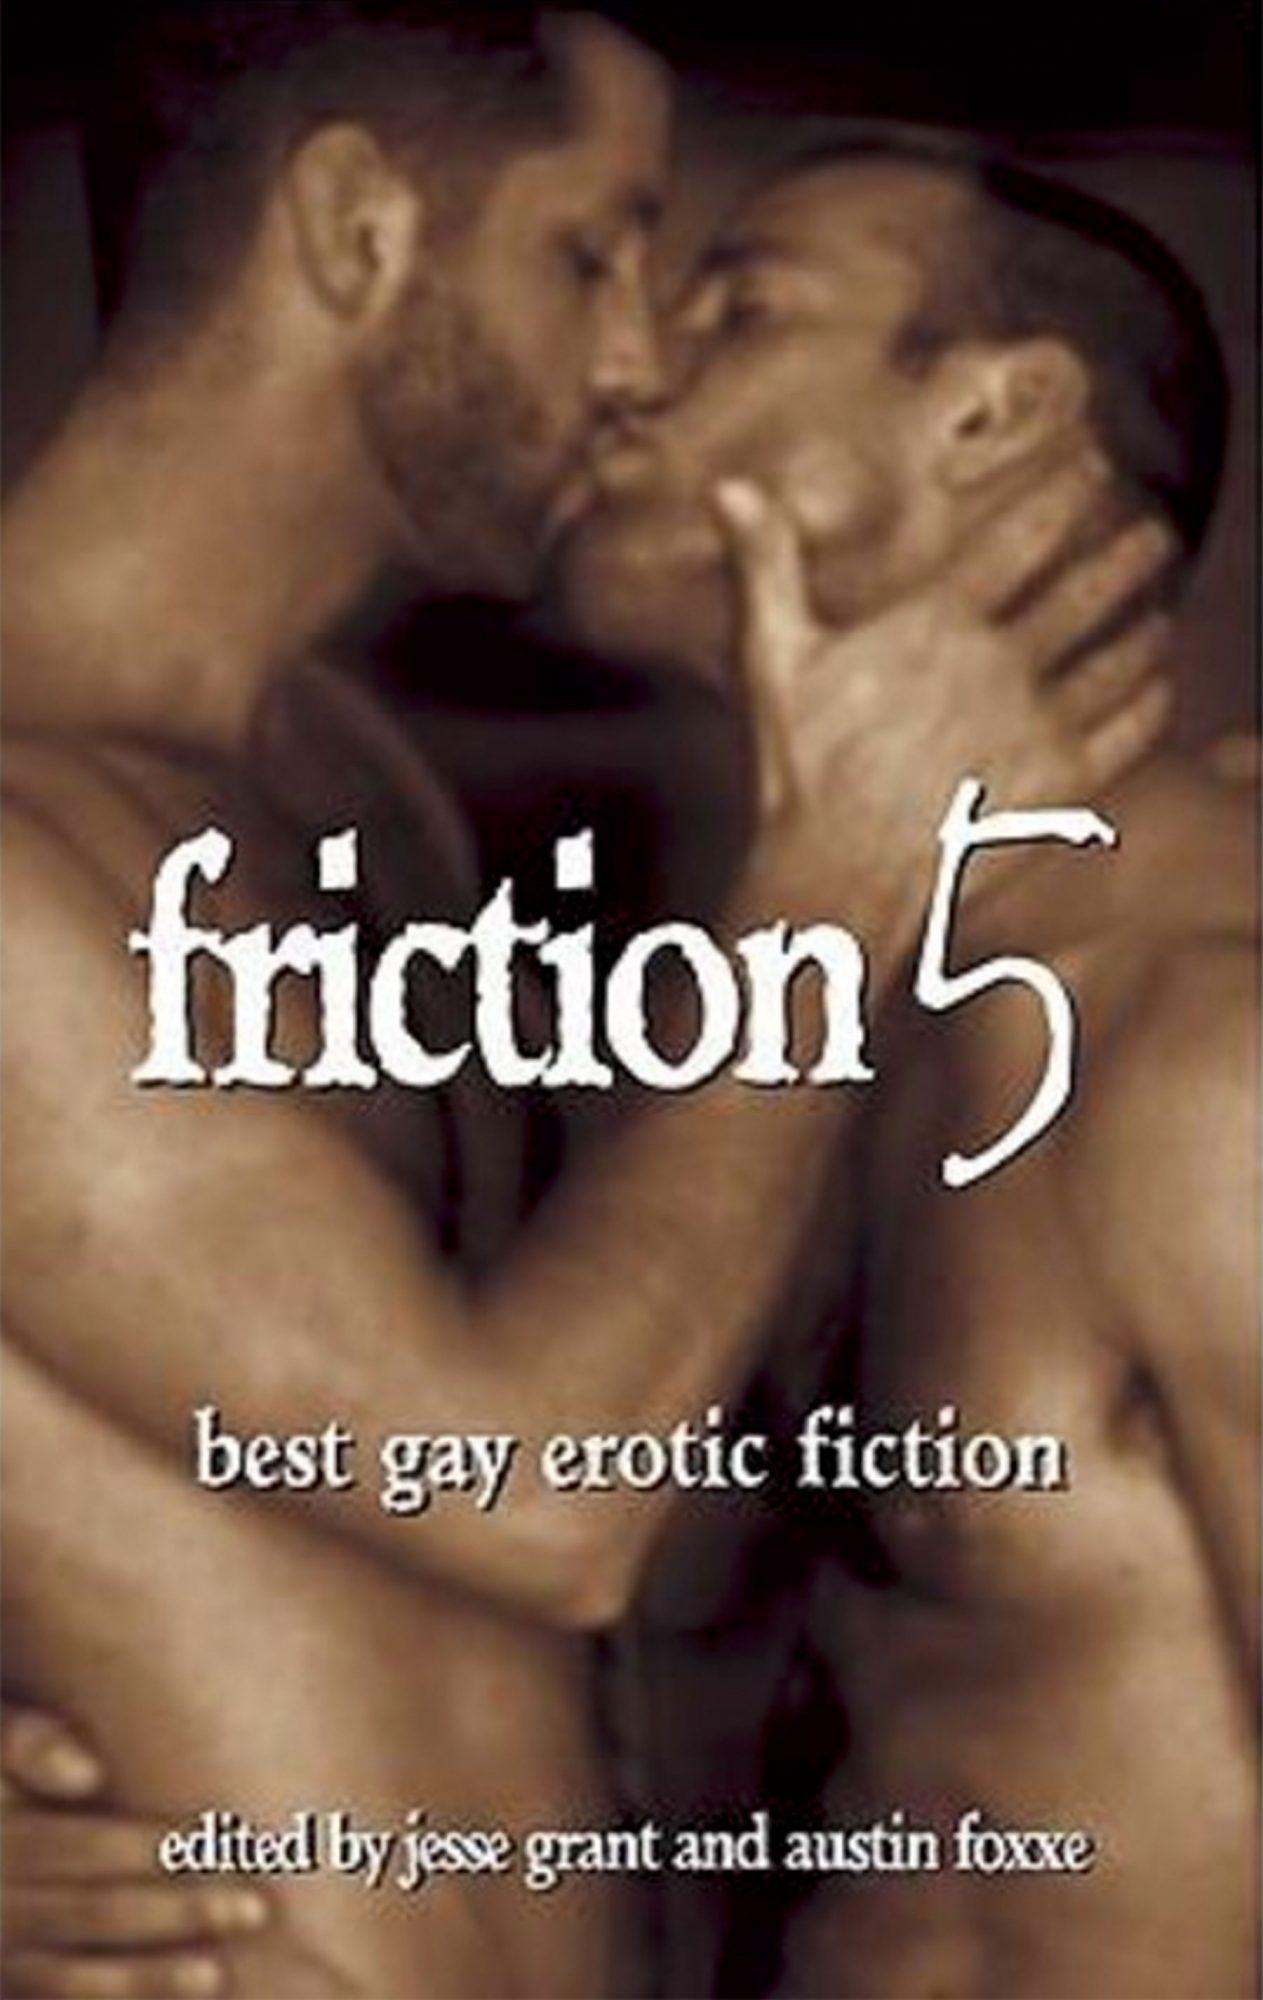 friction5